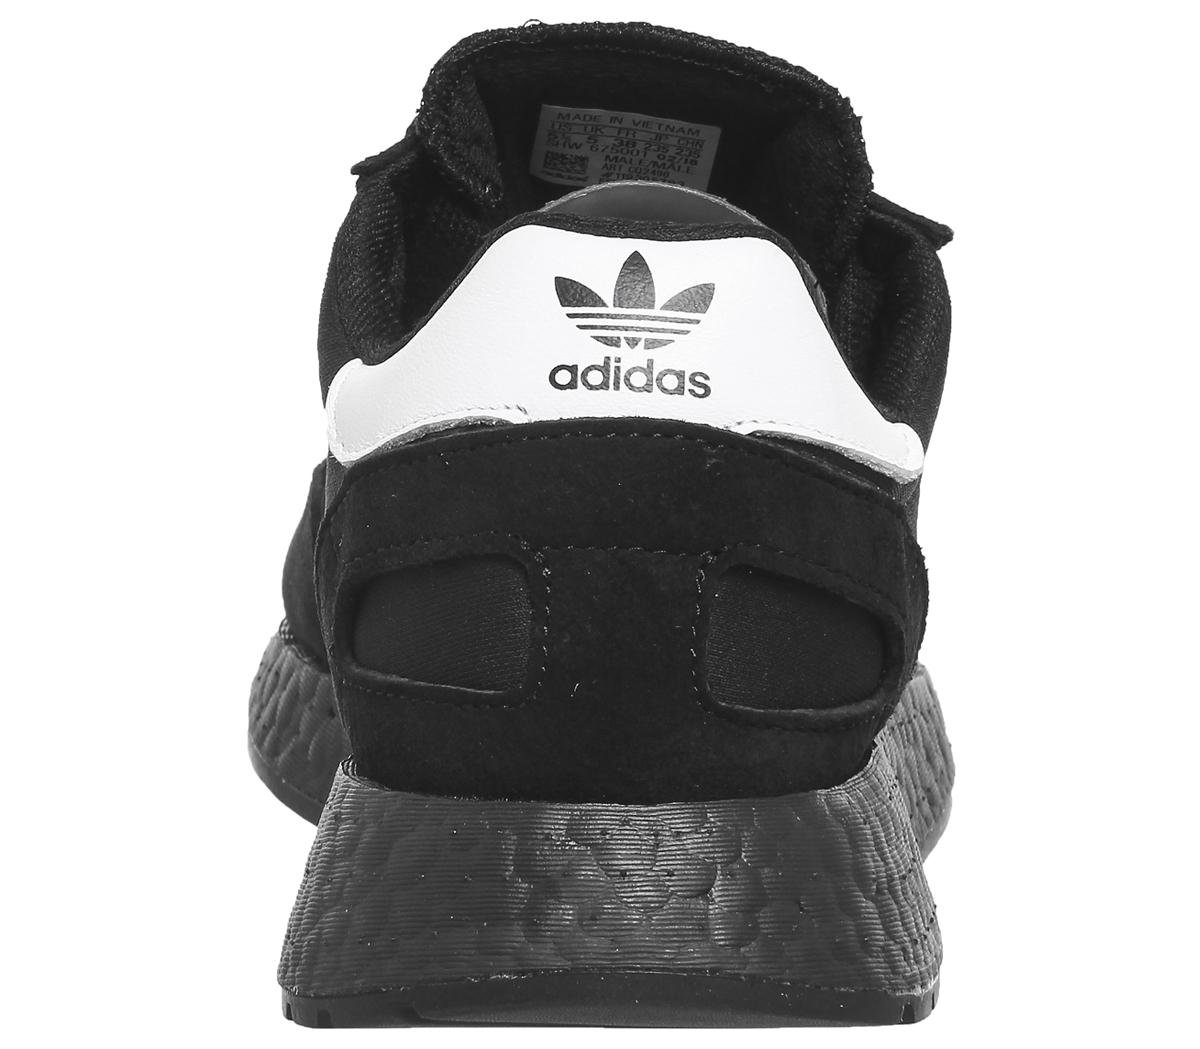 c0adb62f3fd36 Sentinel Mens Adidas I-5923 Trainers BLACK WHITE COPPER Trainers Shoes